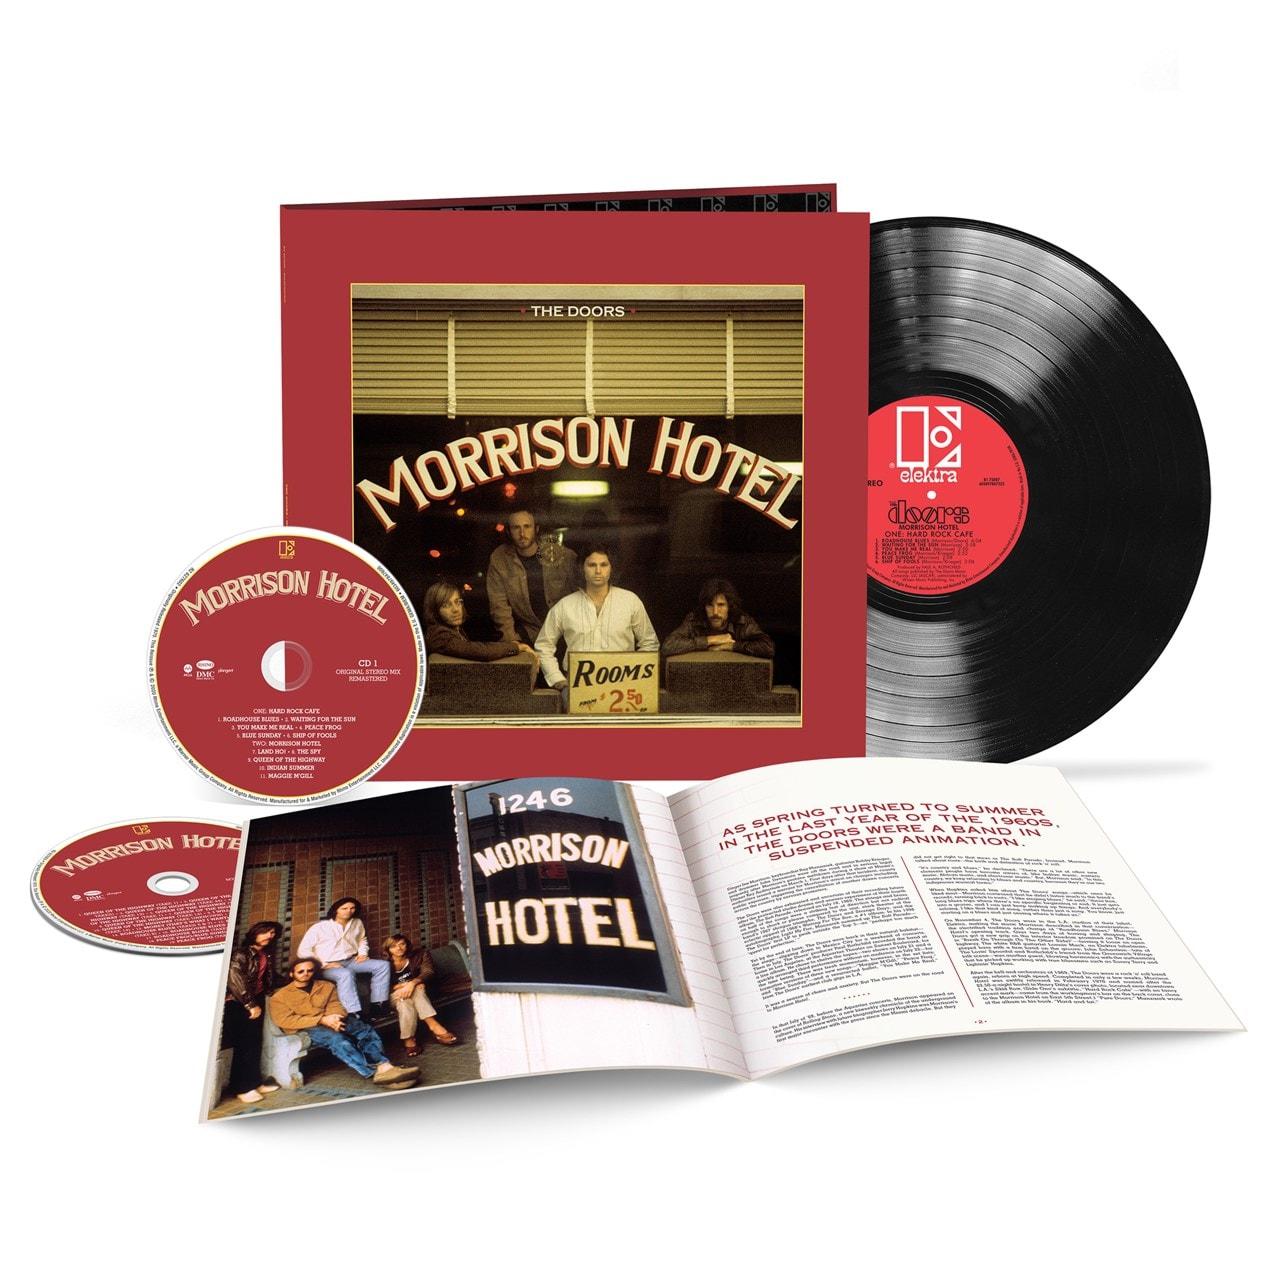 Morrison Hotel - 50th Anniversary Deluxe Edition - 1